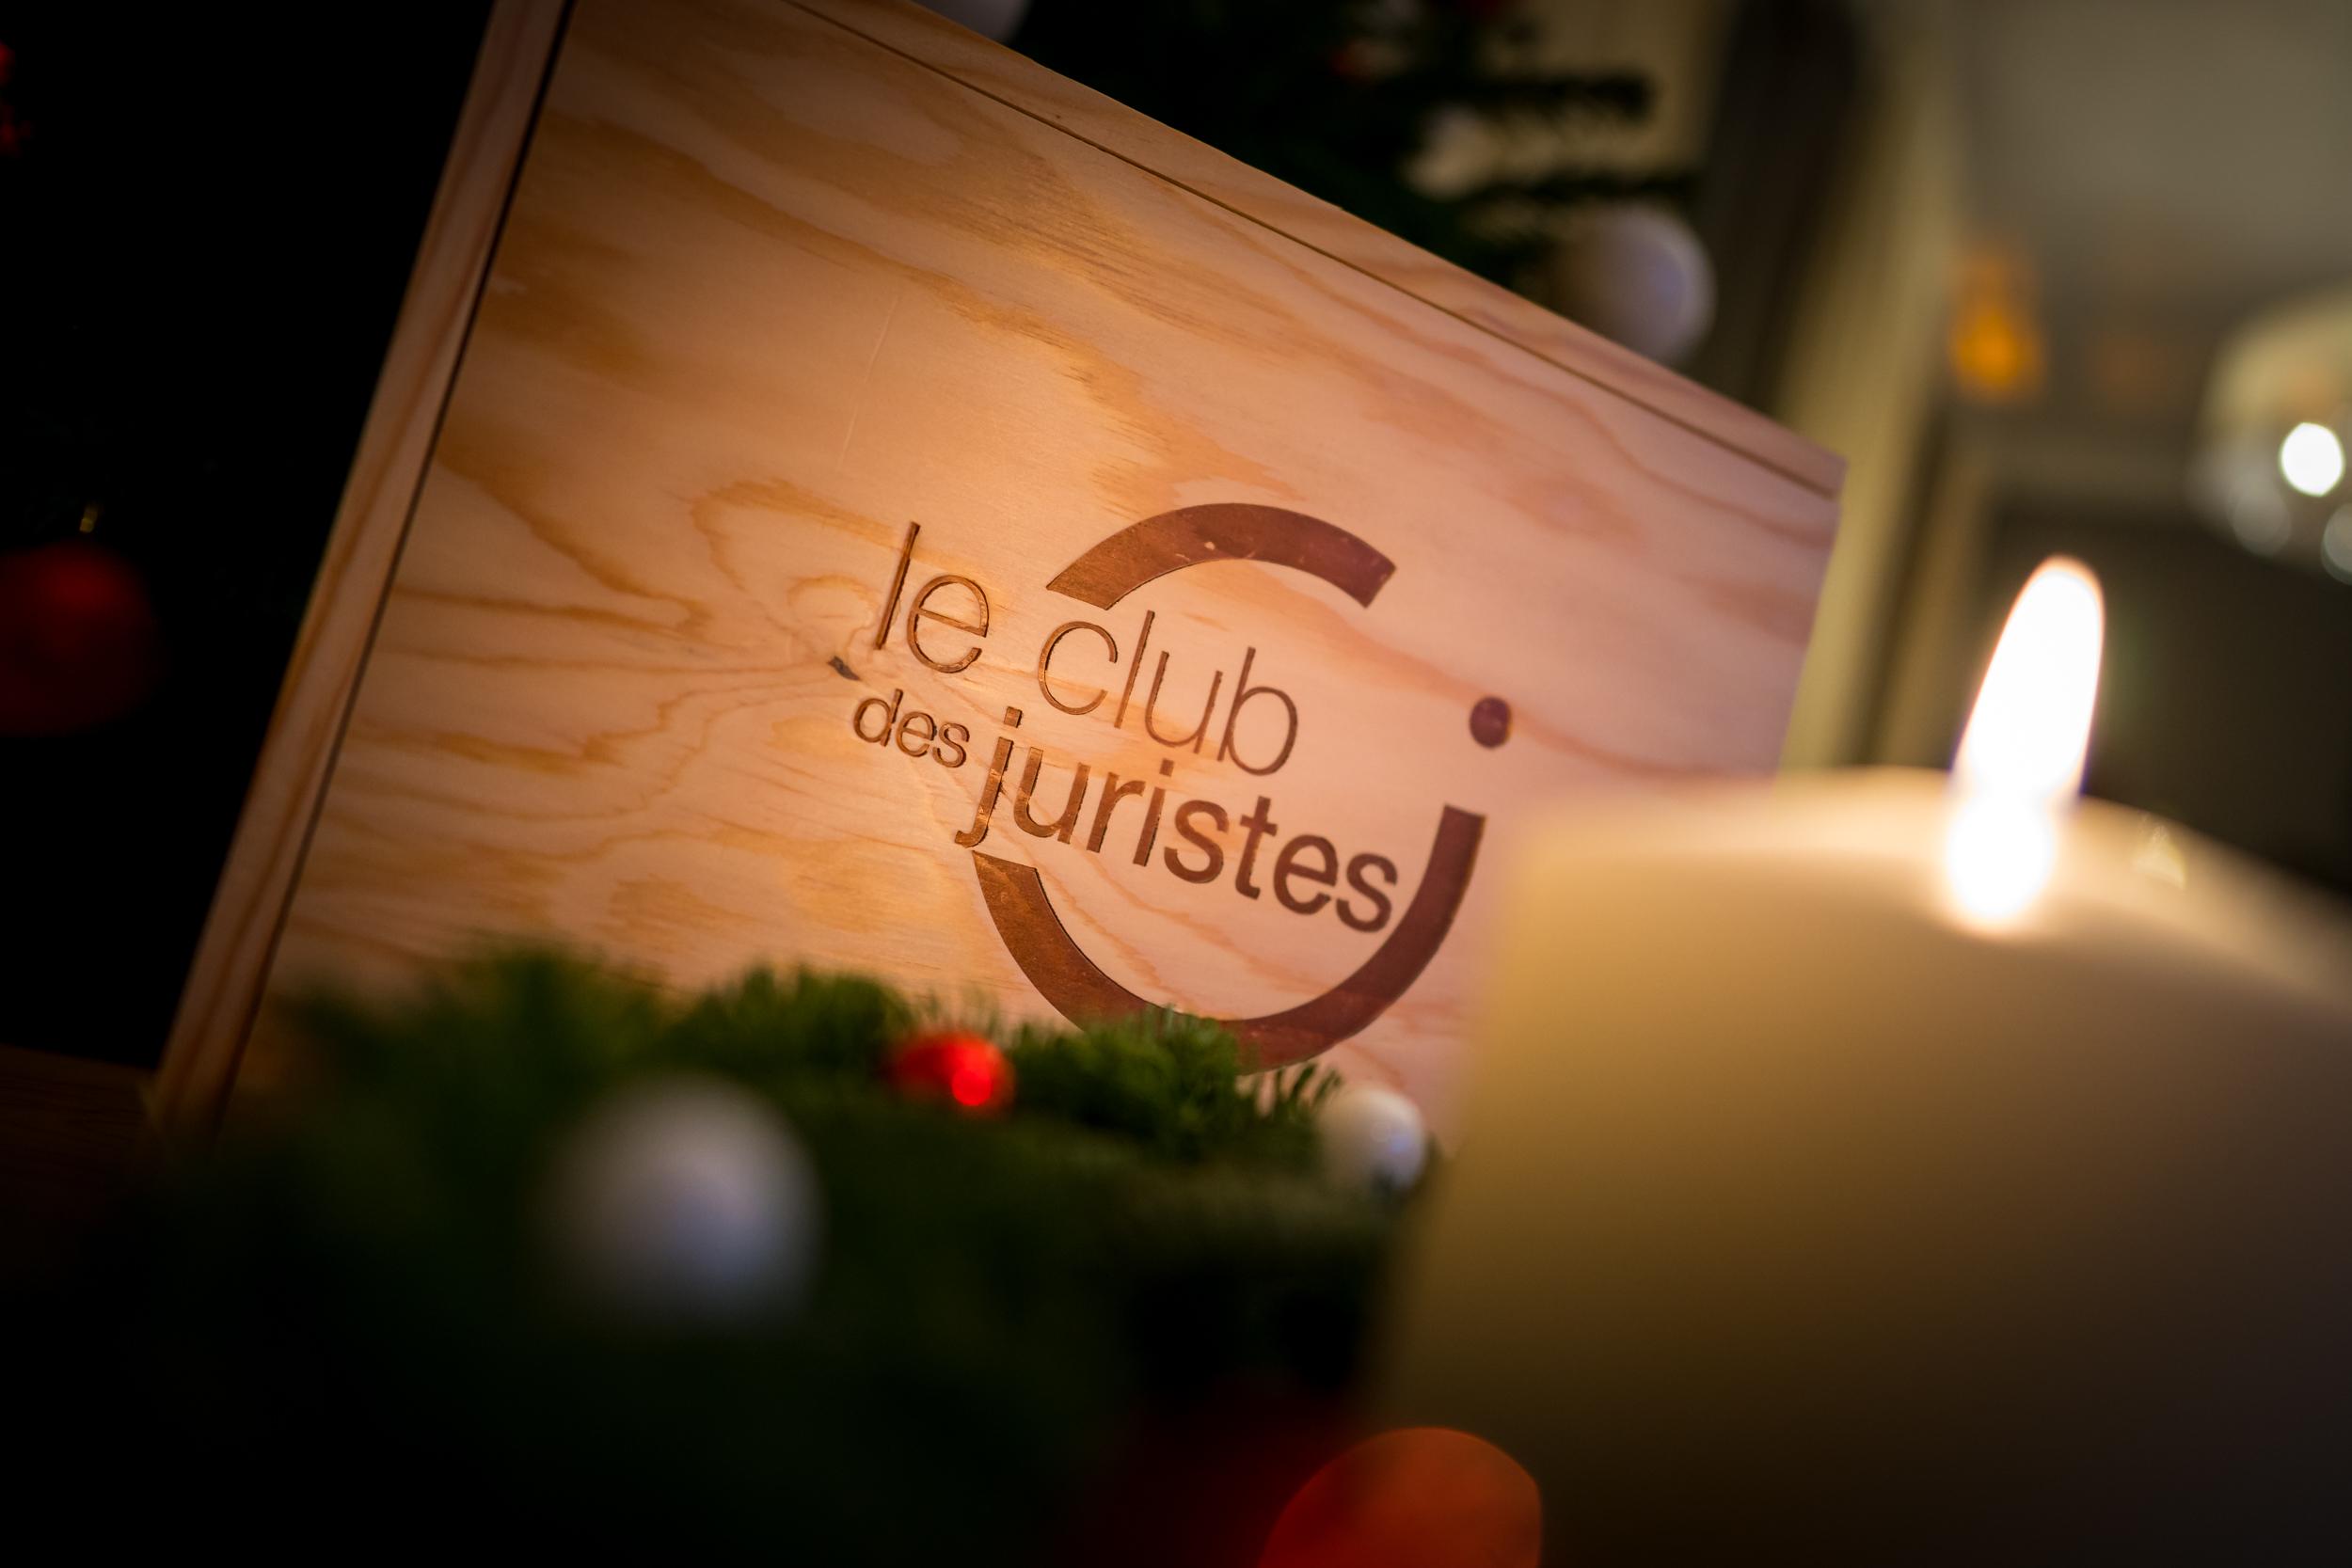 Le Club des Juristes_Diner de Noël _14-12-18 _ Florian Leger_SHARE & DARE_ HD_ N°-120.jpg